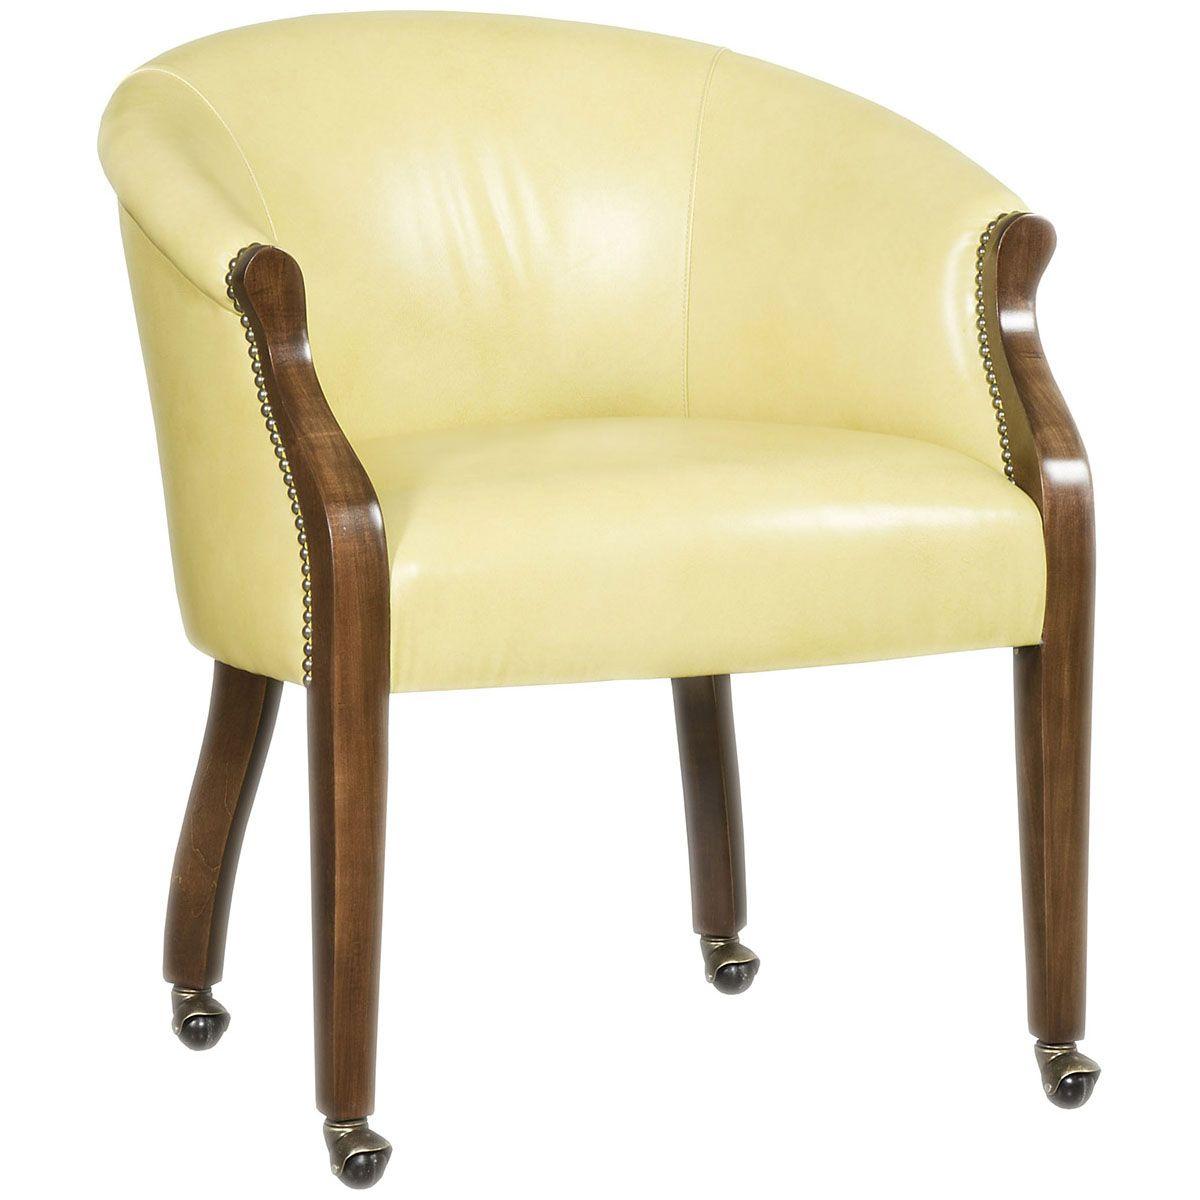 Vanguard Furniture Hagan Game Chair L761 Gc Vanguad Furniture